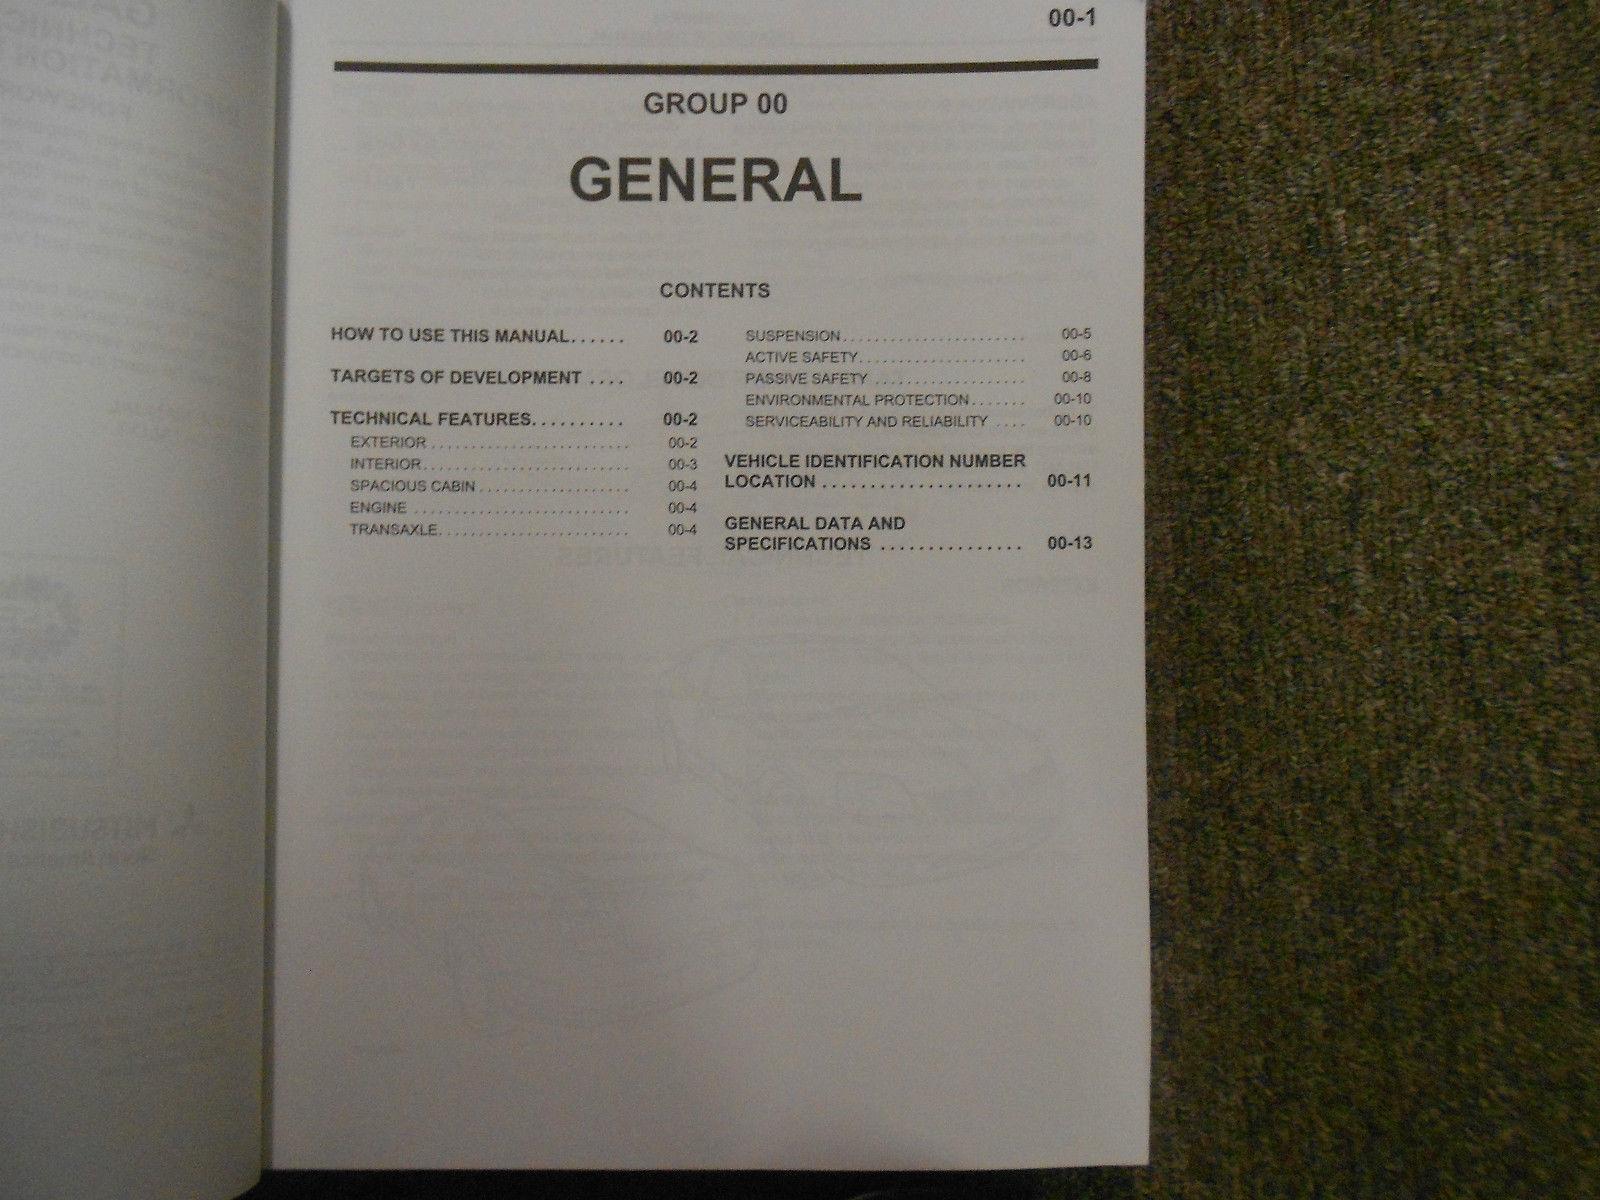 2004 MITSUBISHI GALANT Service Shop Repair Manual 6 VOL SET OEM FACTORY BOOK 04